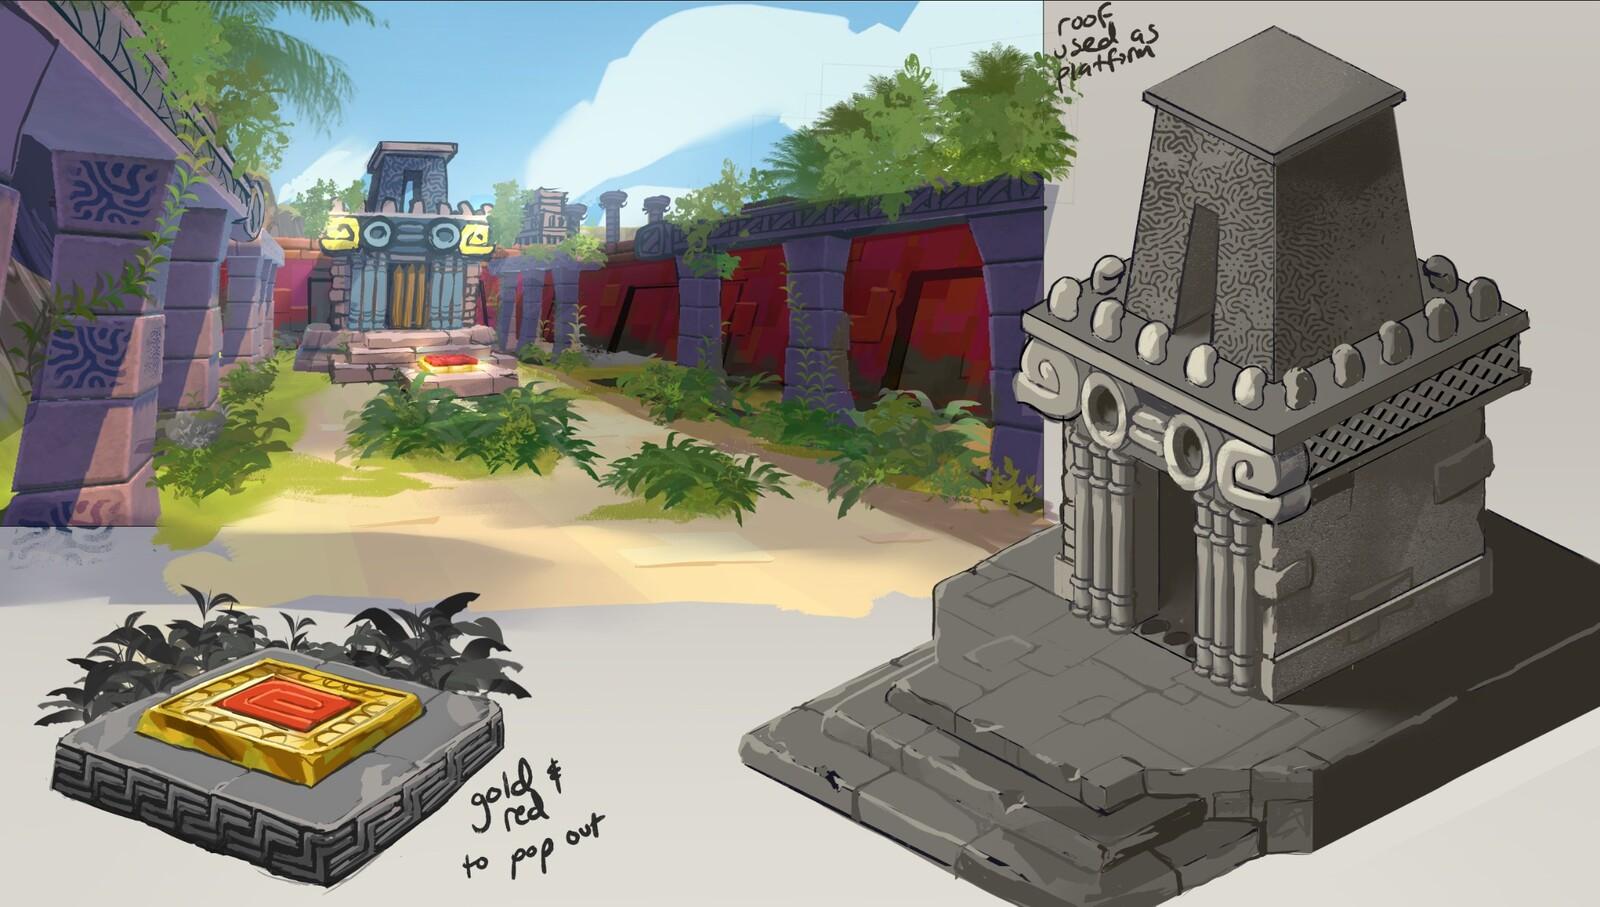 Jungle Stage Development [Mend]